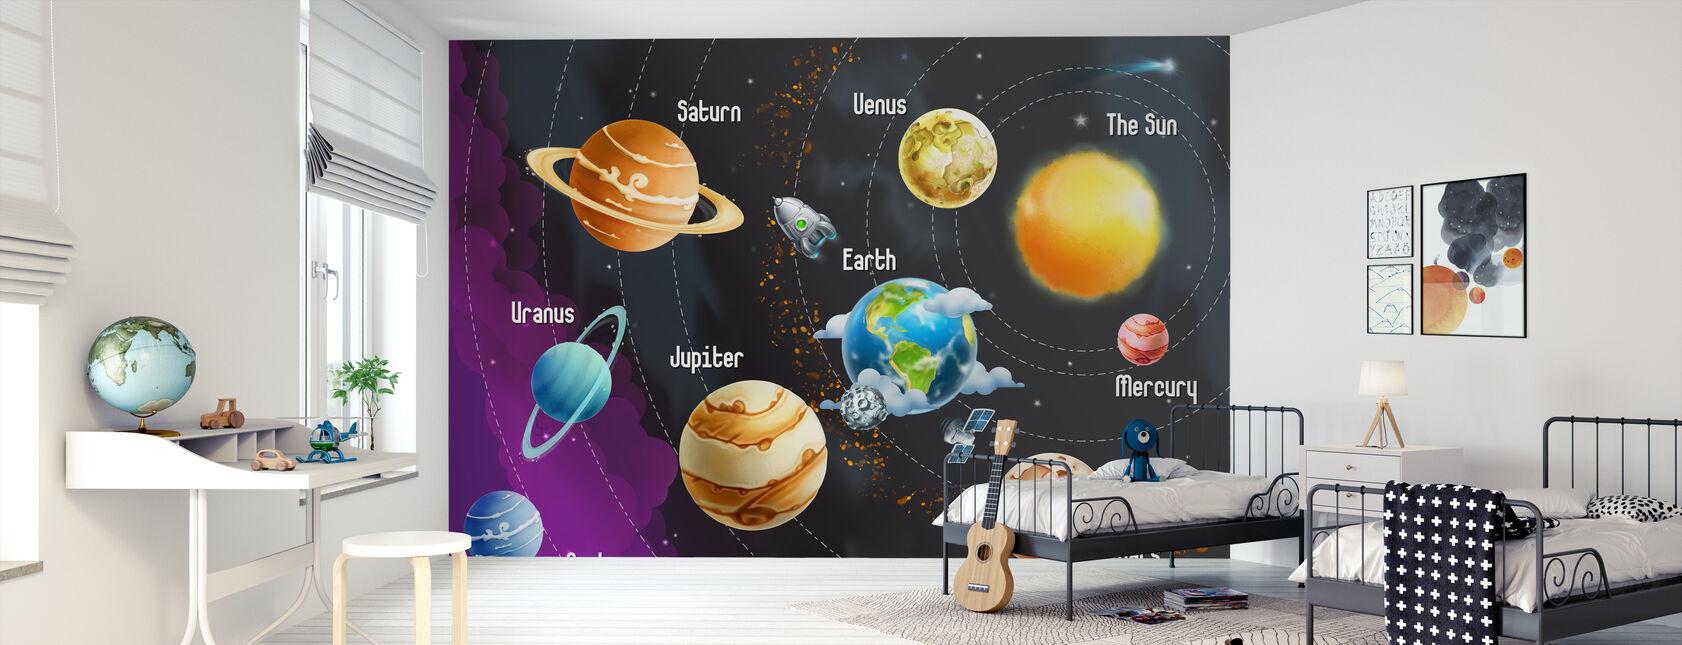 Solar System Planets - Wallpaper - Kids Room